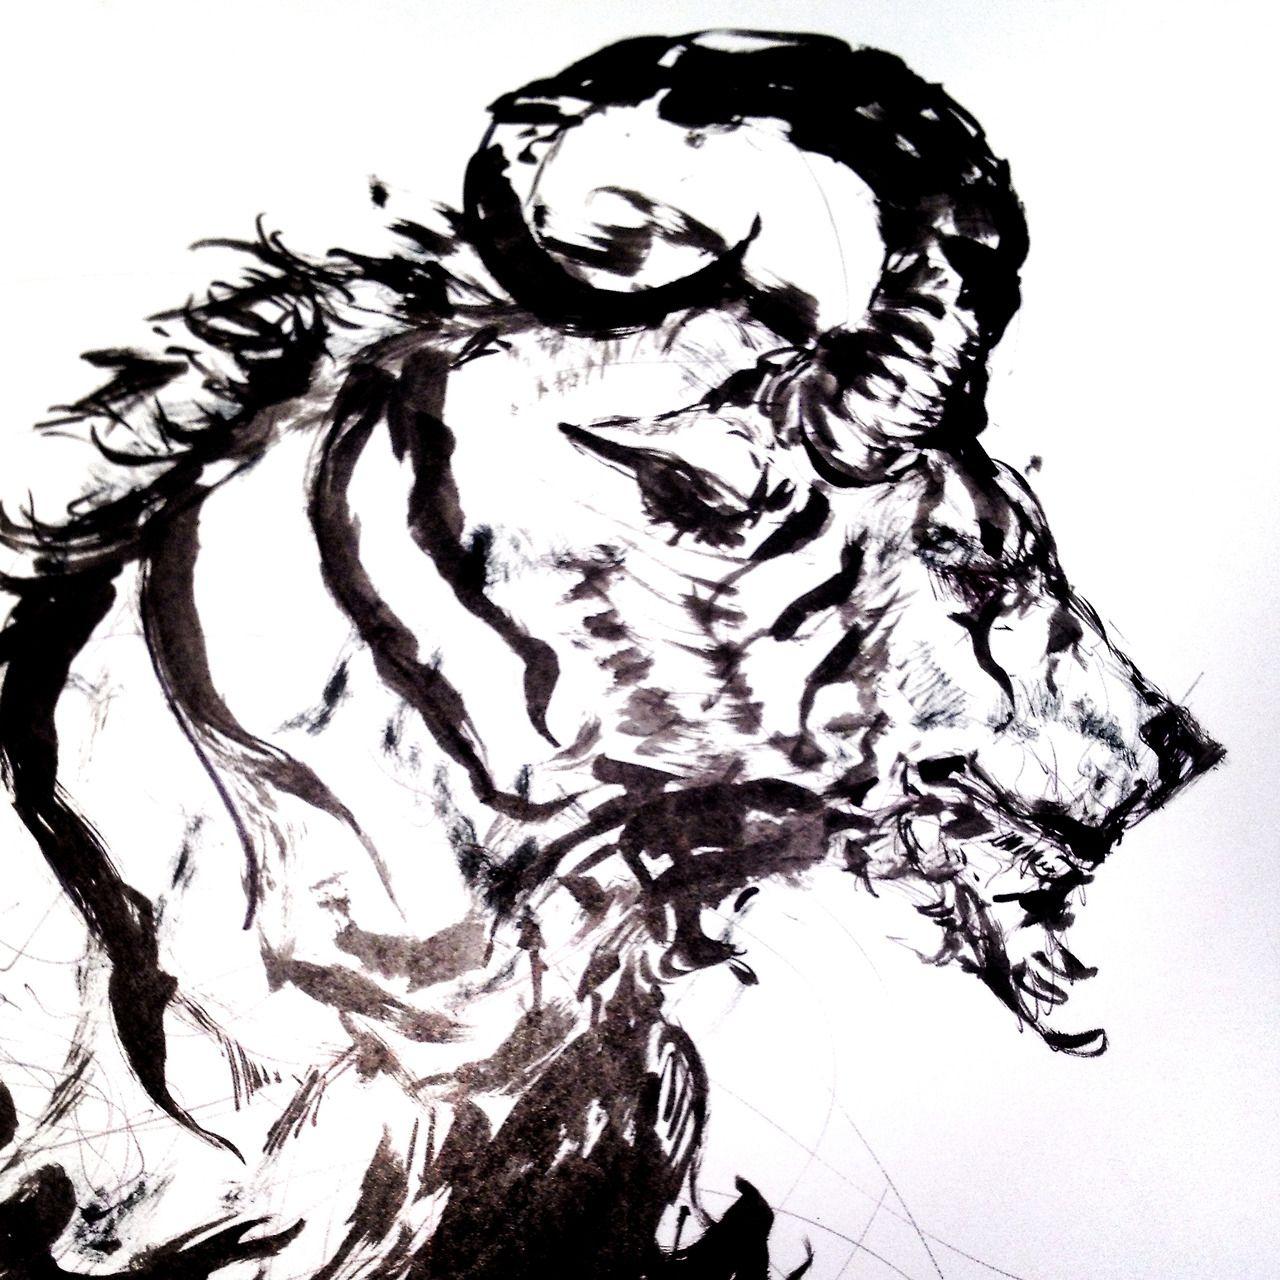 1280x1280 Kekai Kotaki Kekai Kotaki Beast, Sketches And Art